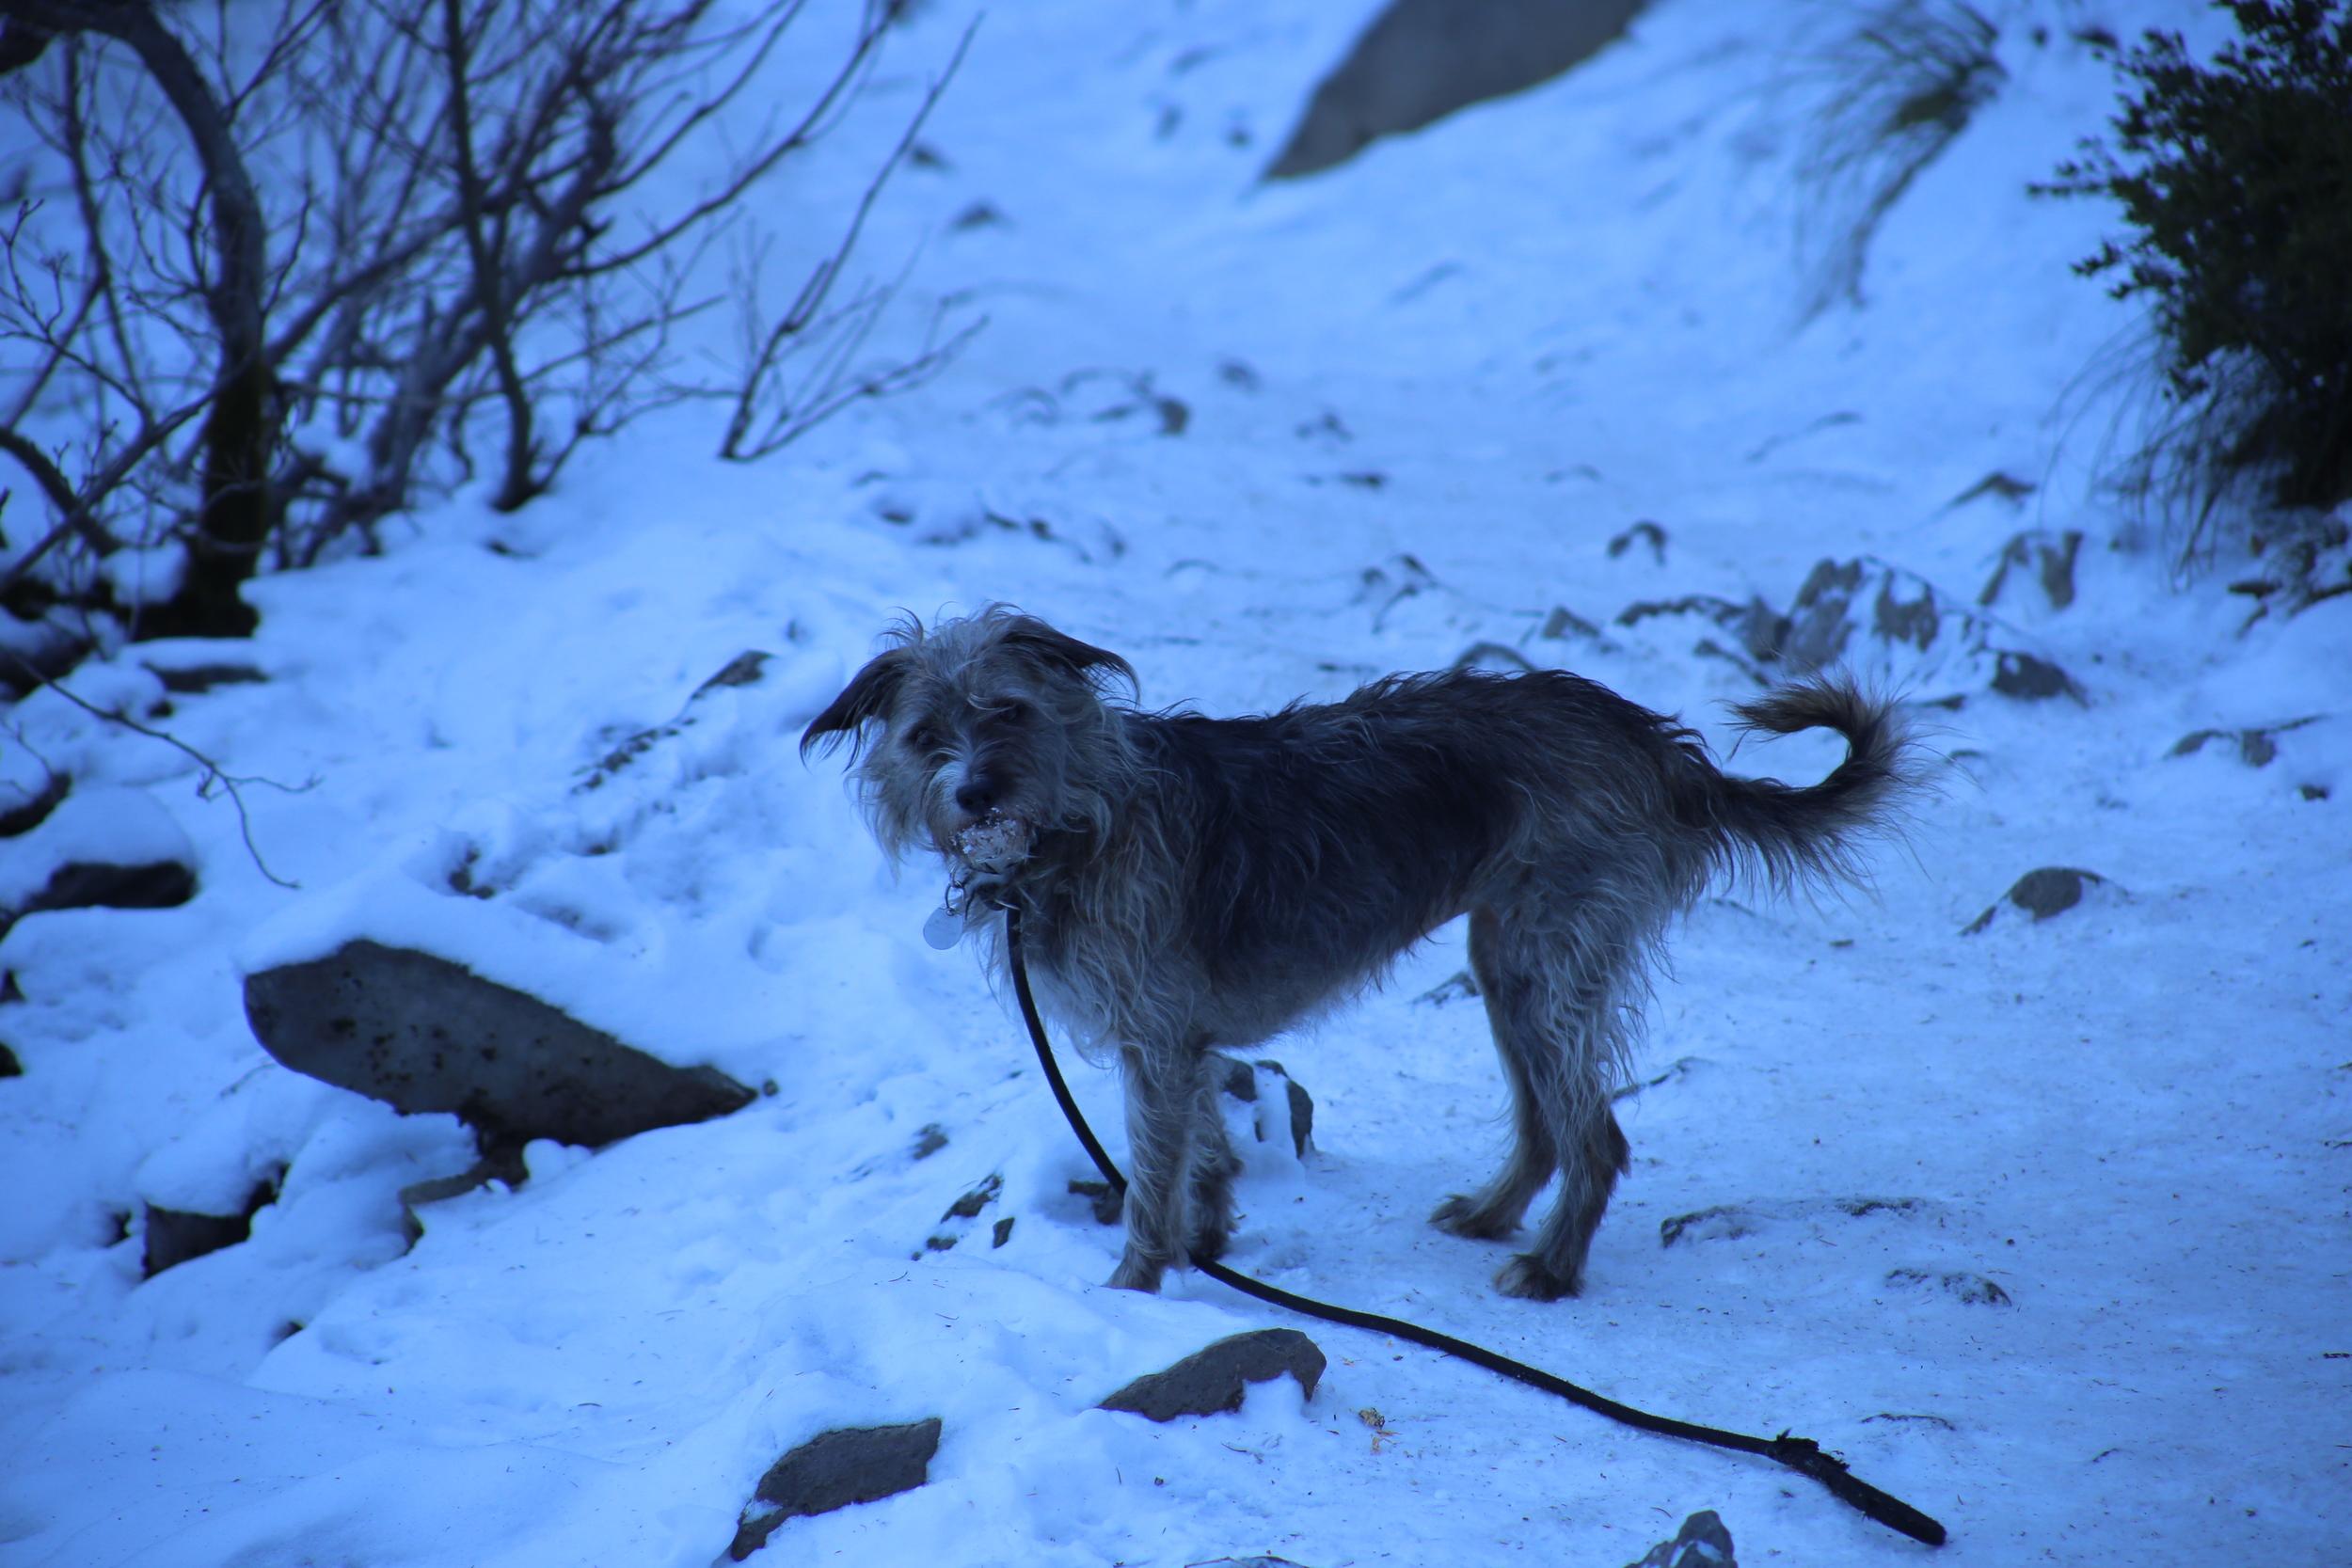 Maddie the Magic Dog loves snow